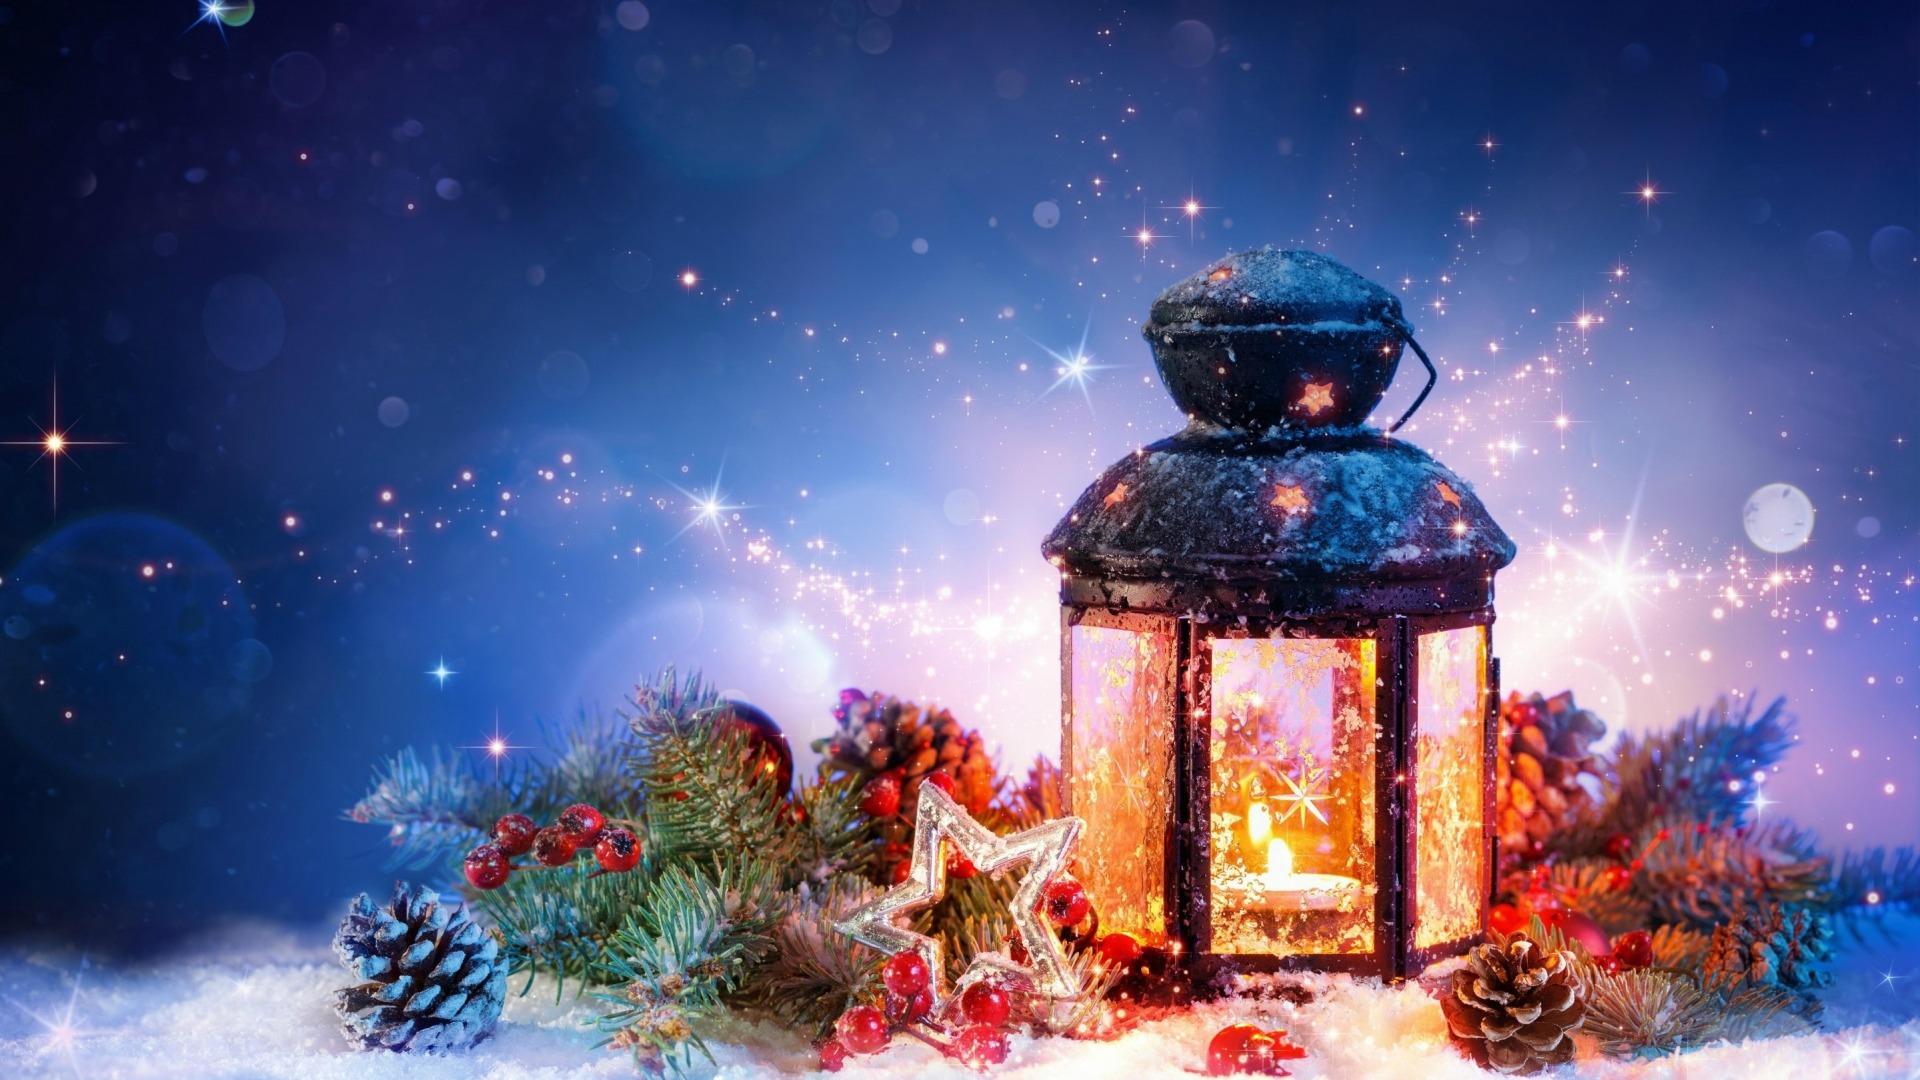 Christmas Wallpaper   Happy New Year 2019b Wishes 37145 1920x1080